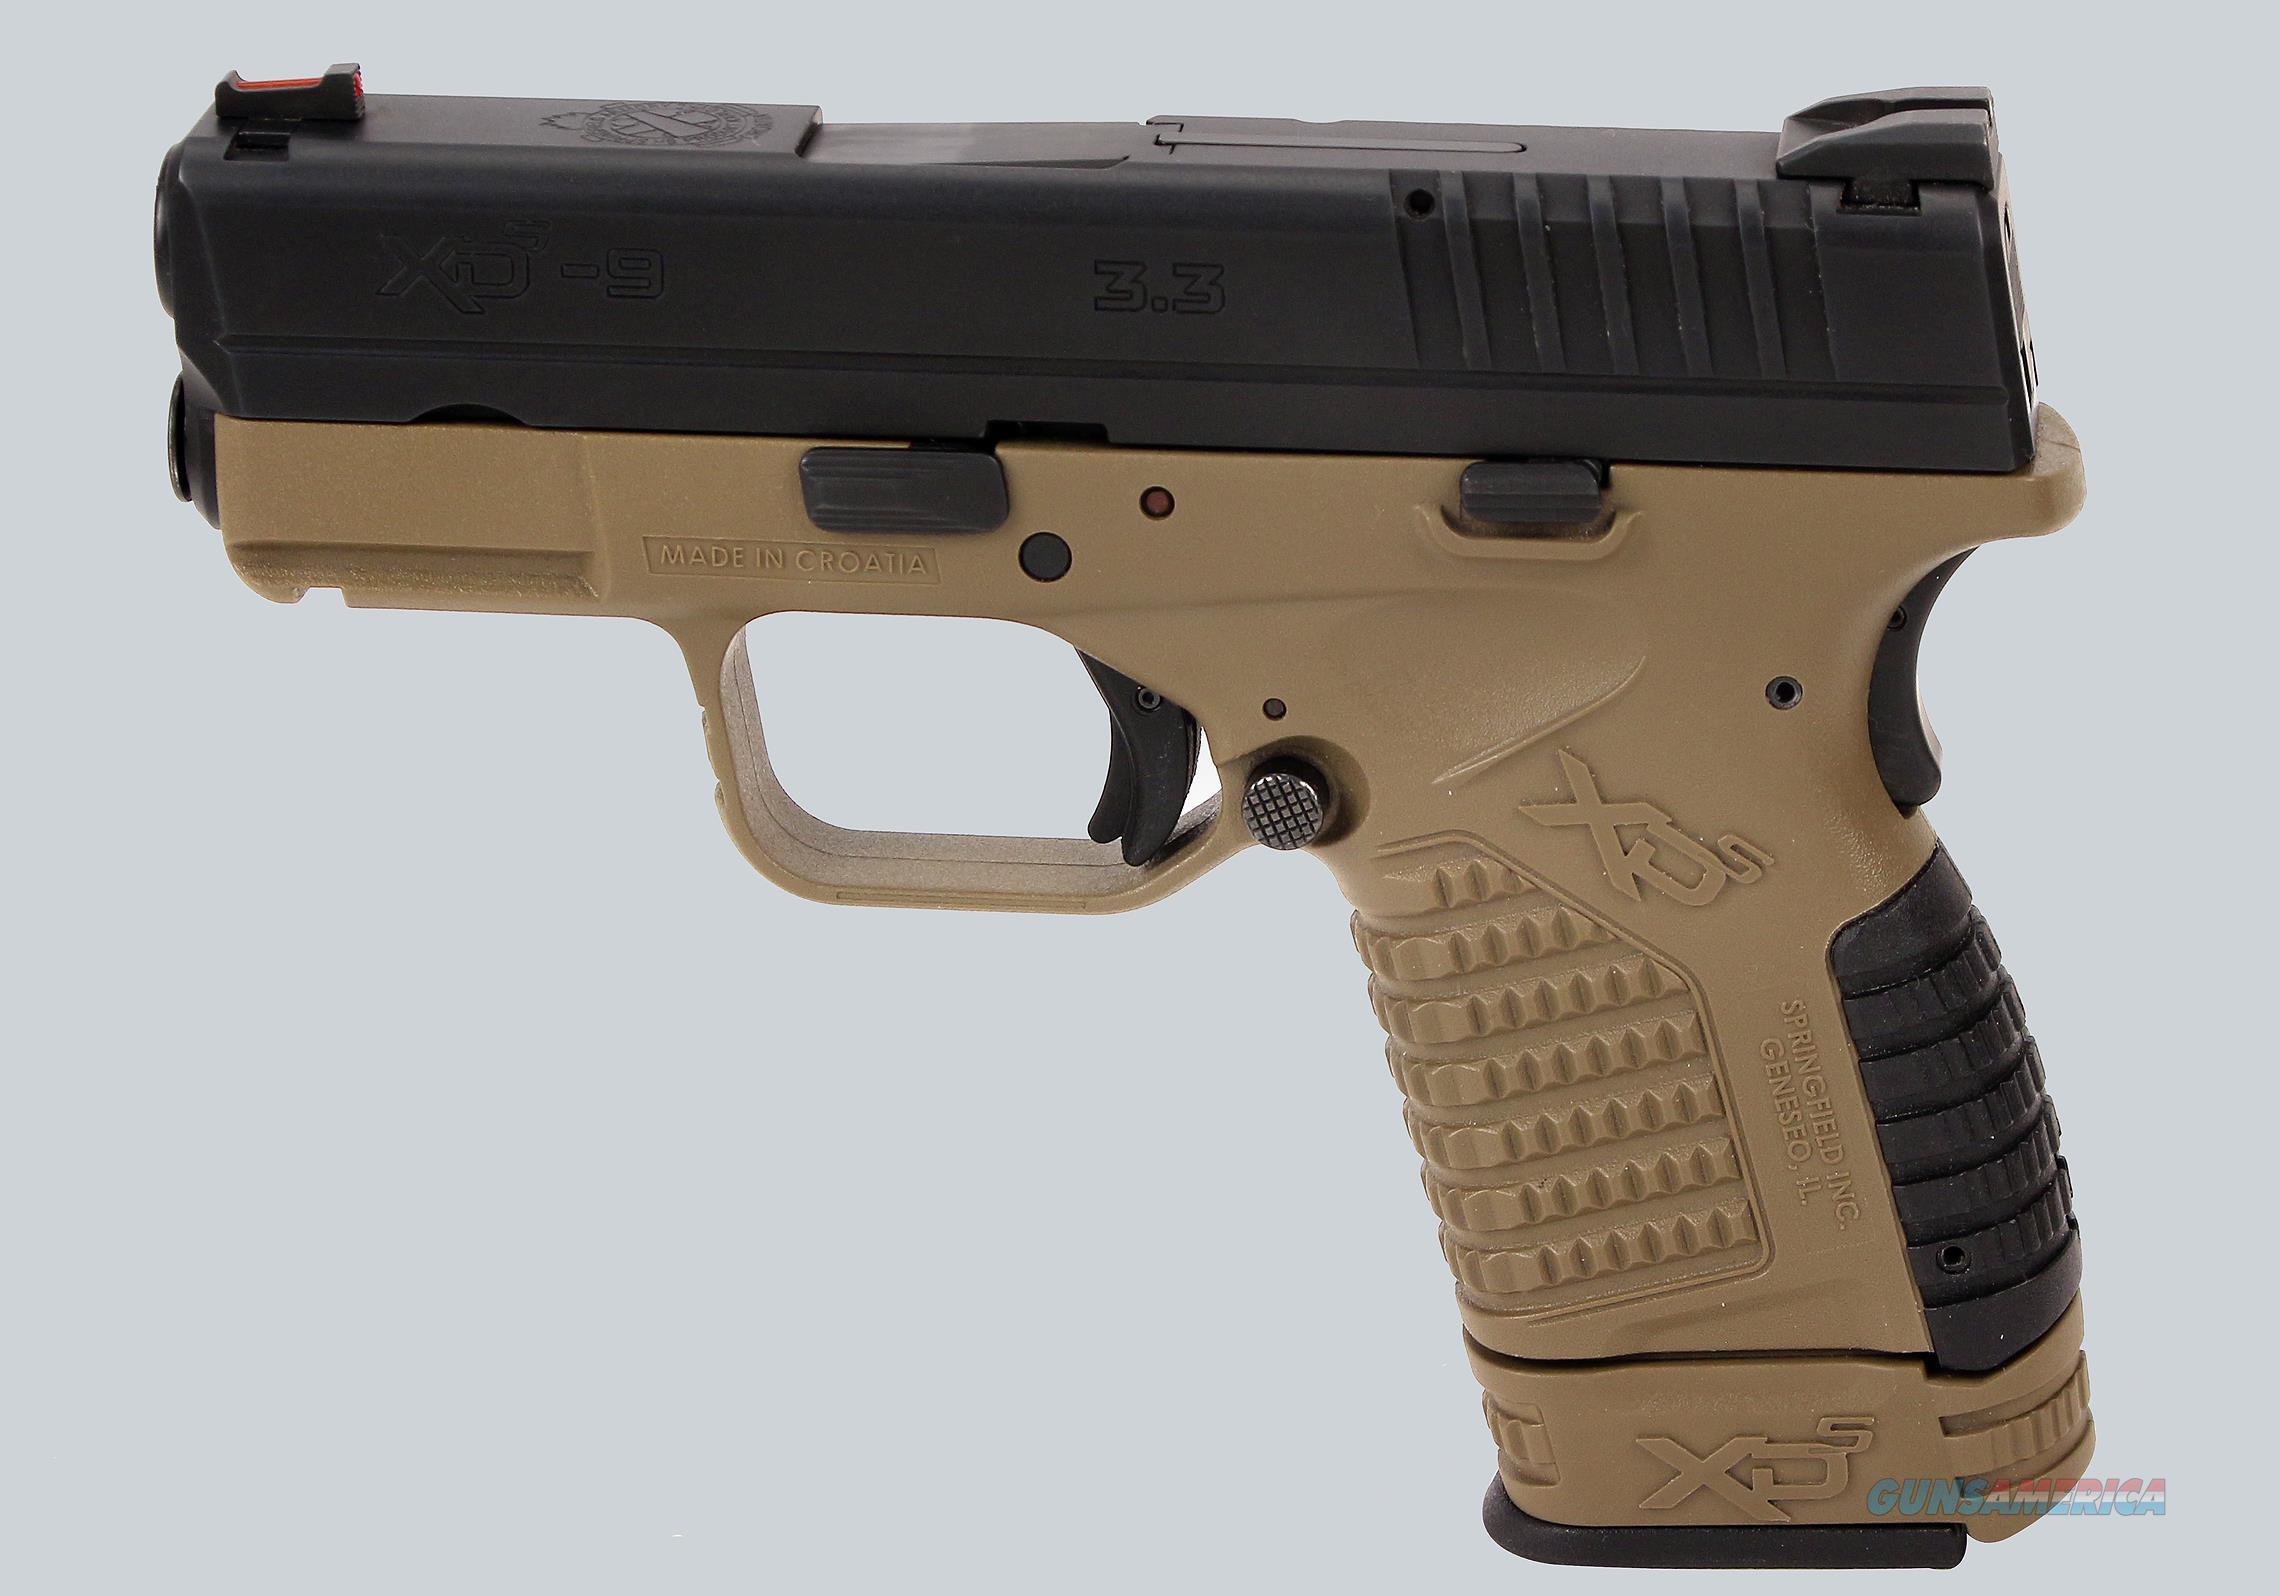 Springfield Armory 9mm XDS-9 Pistol  Guns > Pistols > Springfield Armory Pistols > XD-S